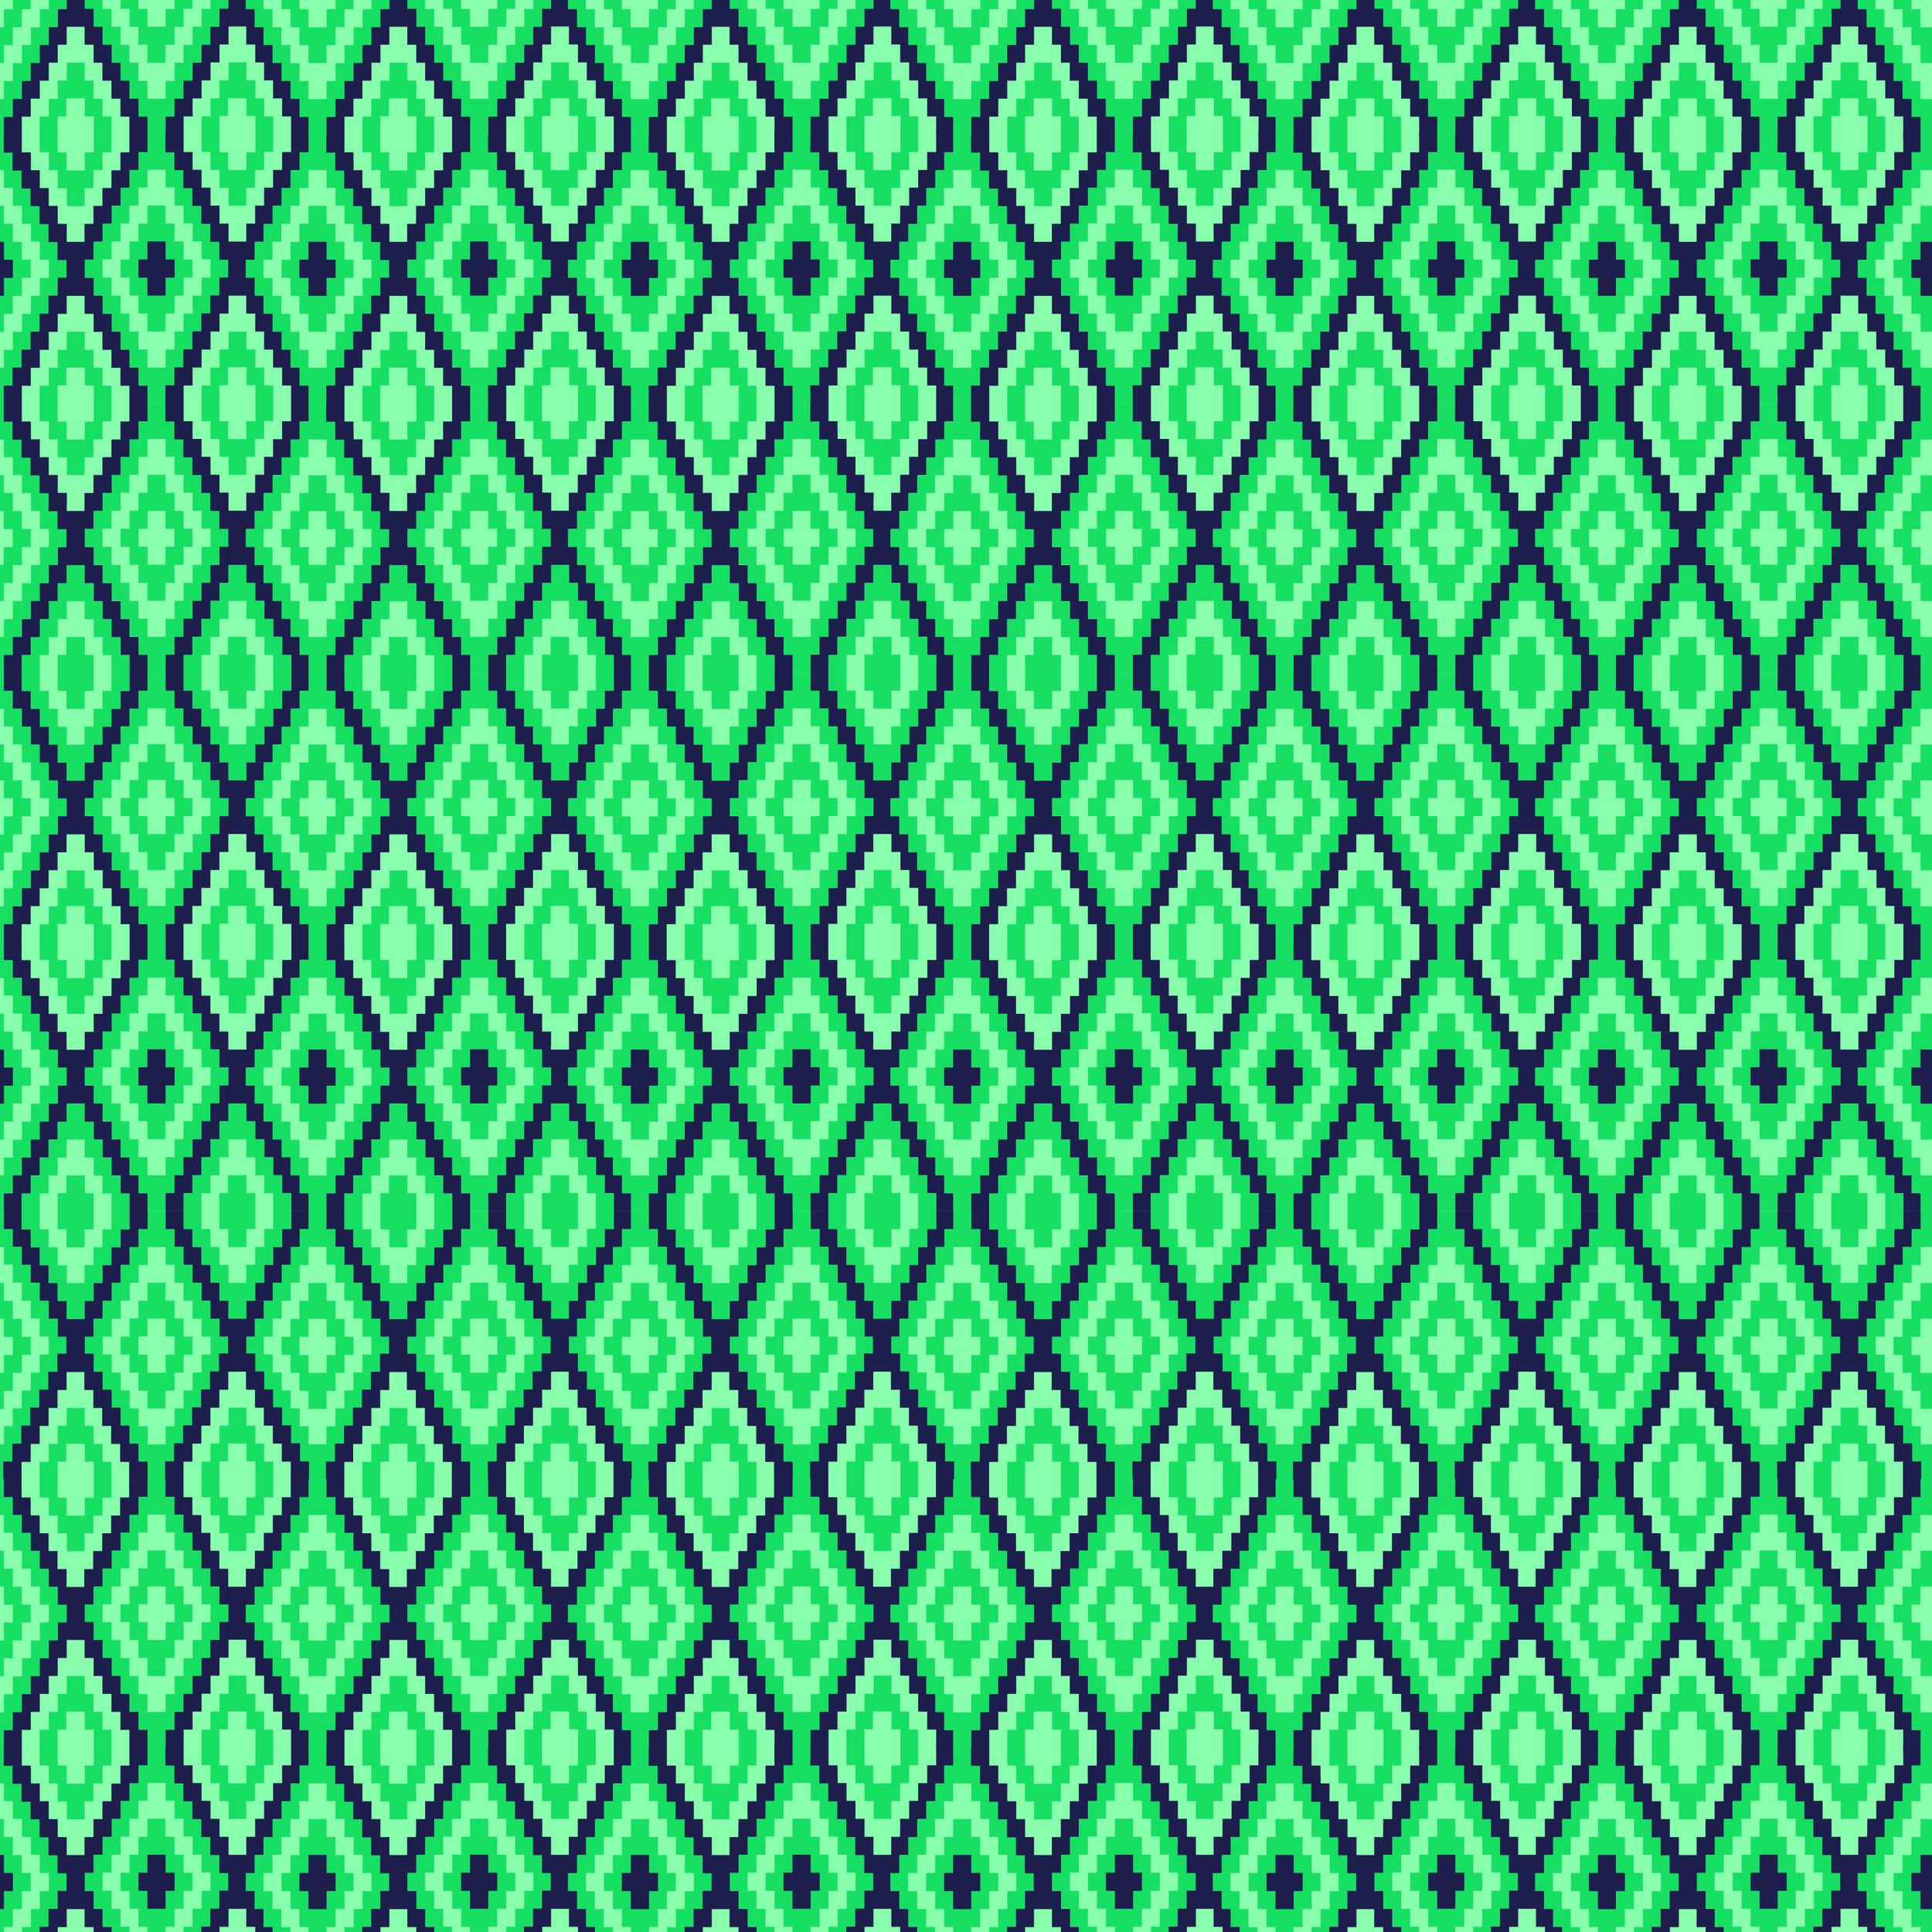 C4746-TEAL_LaVieBoheme_Stitch_300dpi.jpg